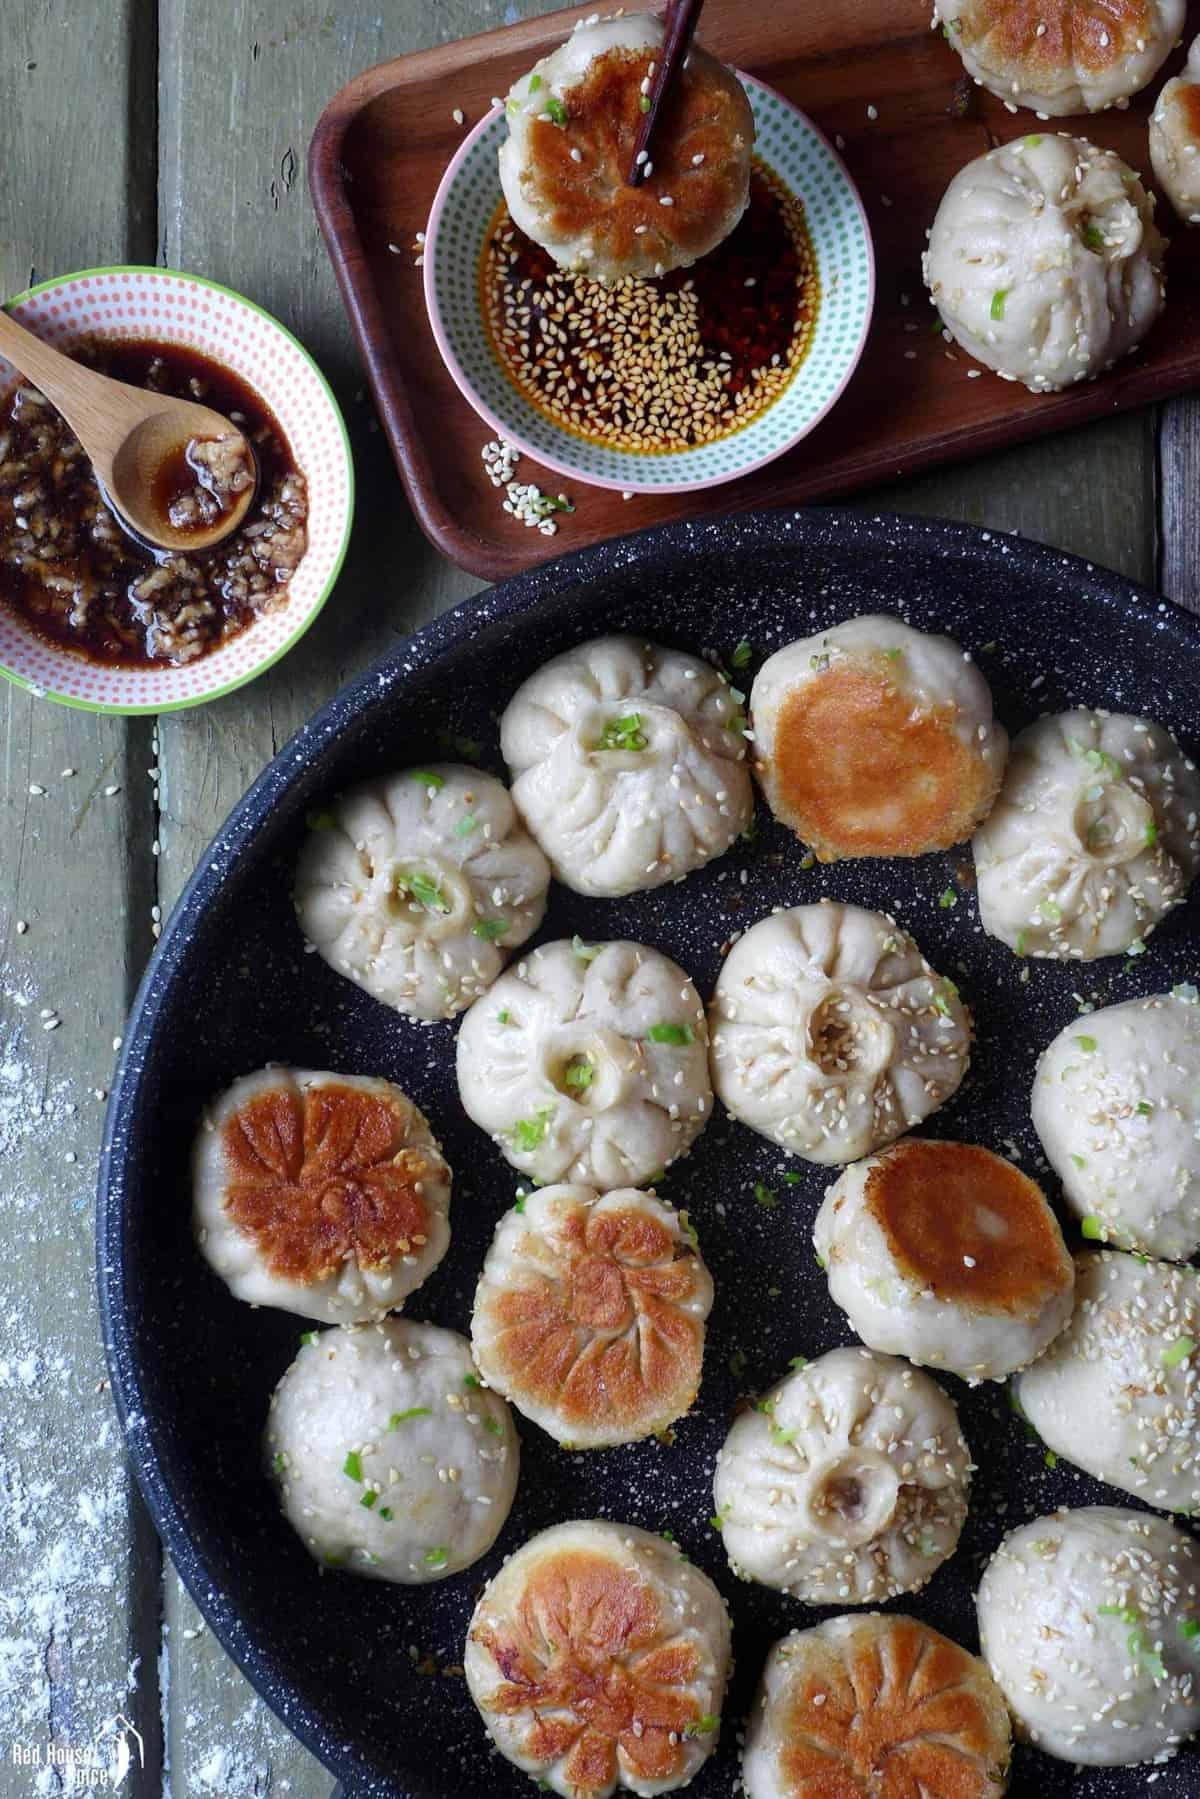 Pan-fried-pork-buns-in-a-pan